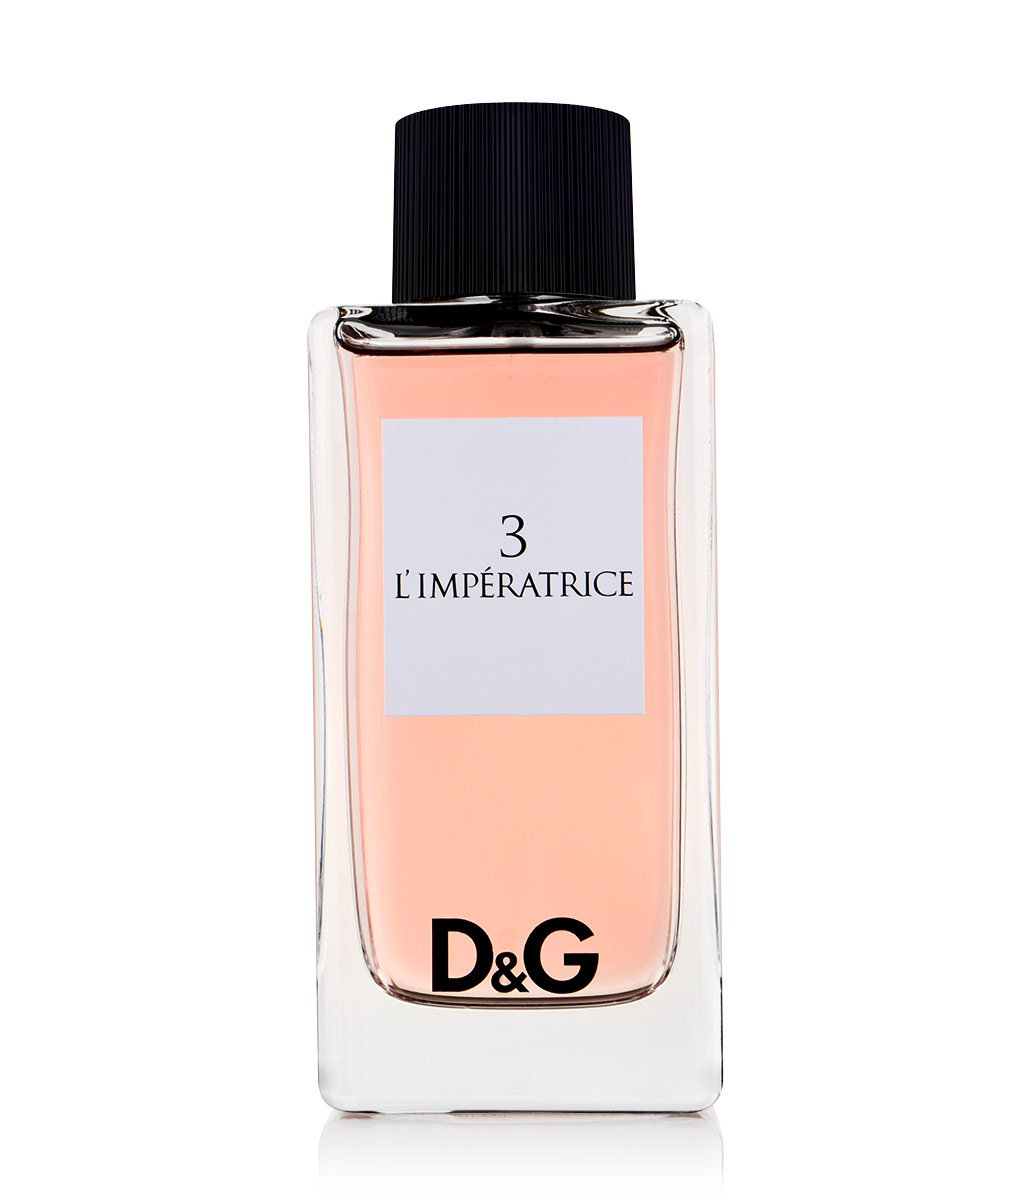 dolce gabbana 3 l imperatrice parfum bestellen flaconi. Black Bedroom Furniture Sets. Home Design Ideas